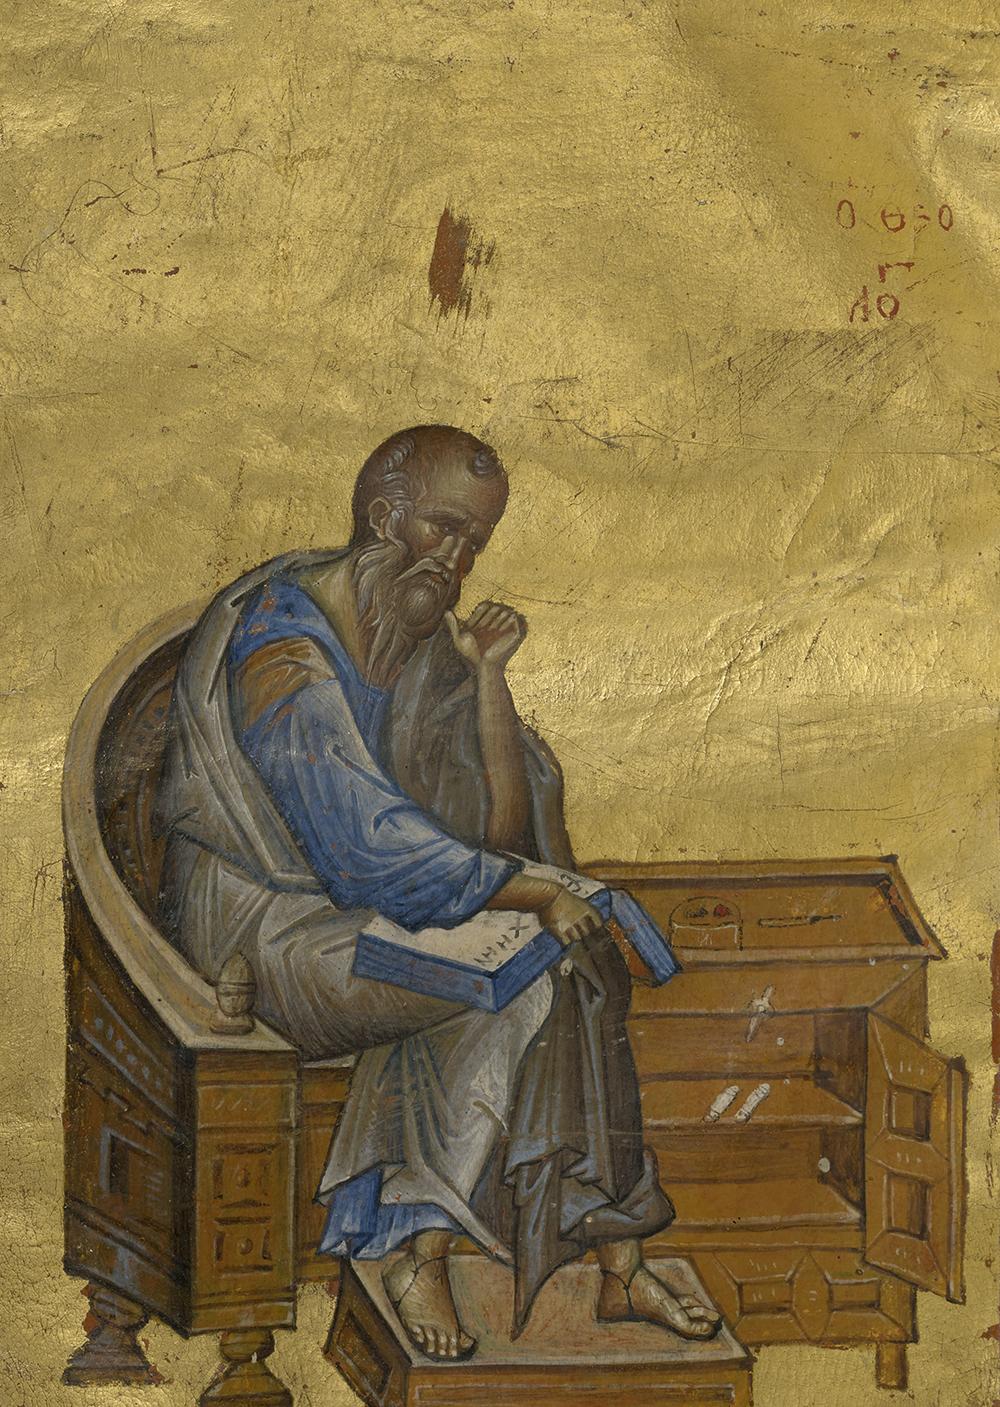 Saint John, late thirteenth century. © The J. Paul Getty Museum, Los Angeles. Digital image courtesy of the Getty's Open Content Program.